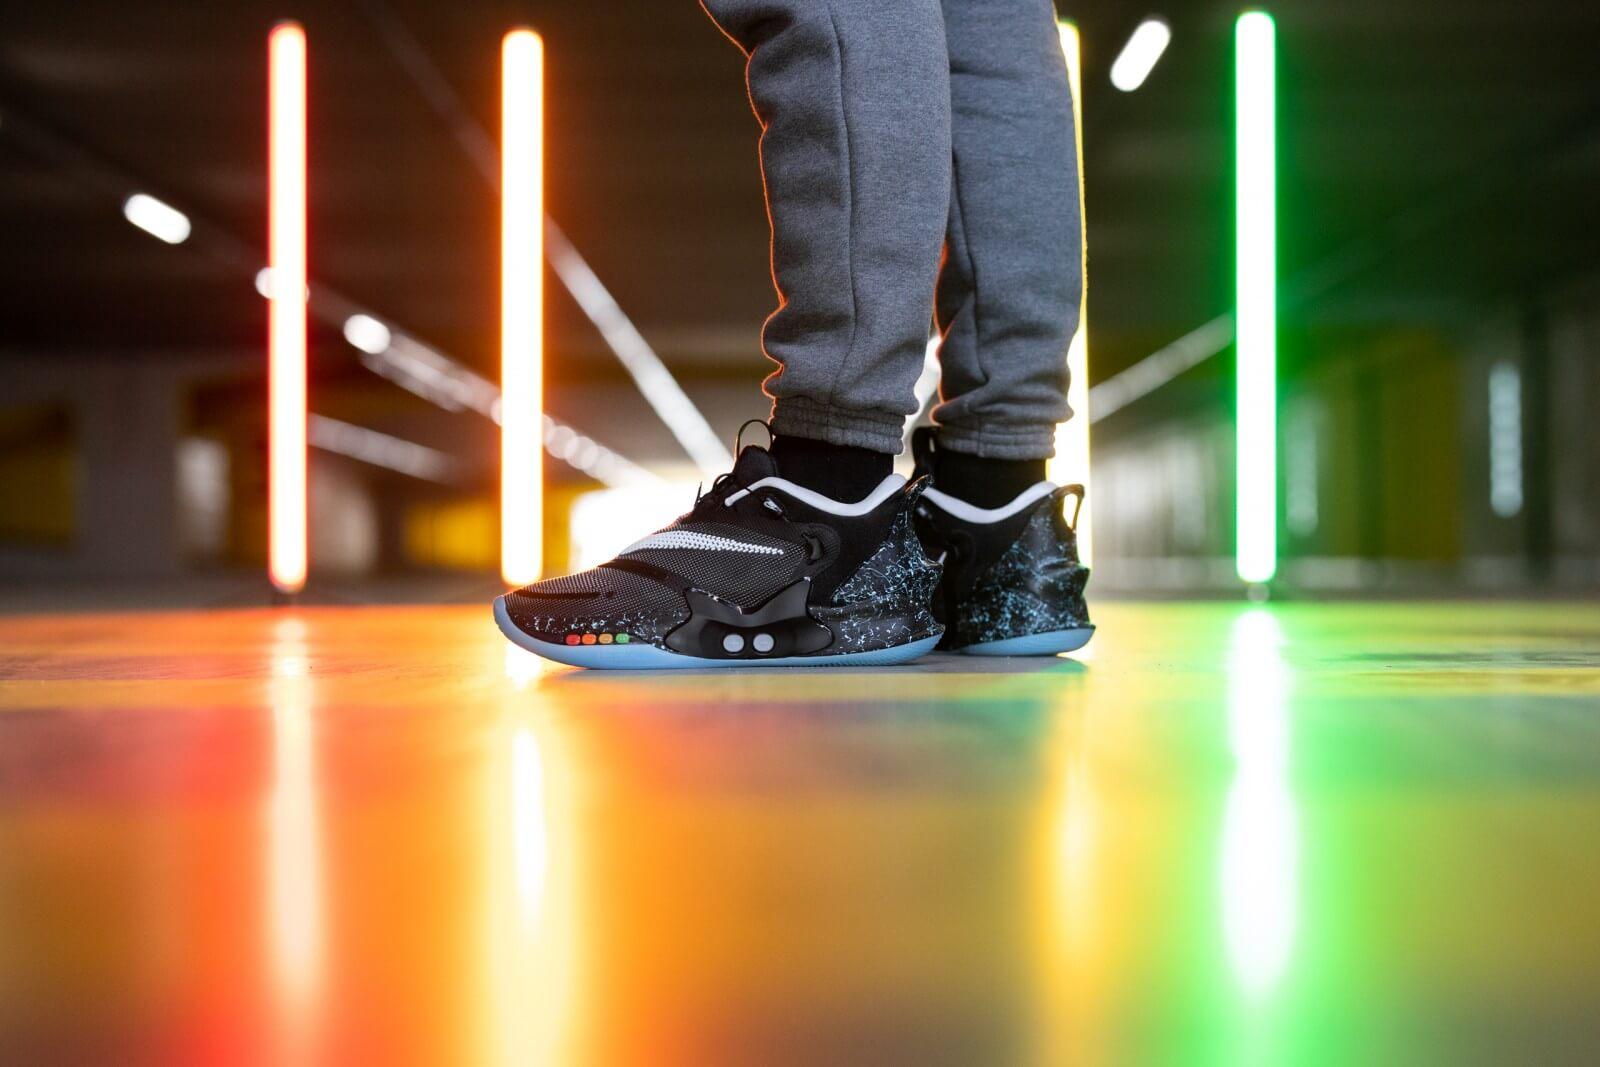 Nike Adapt Bb 2 0 Black Mag Black White Bq5397 002